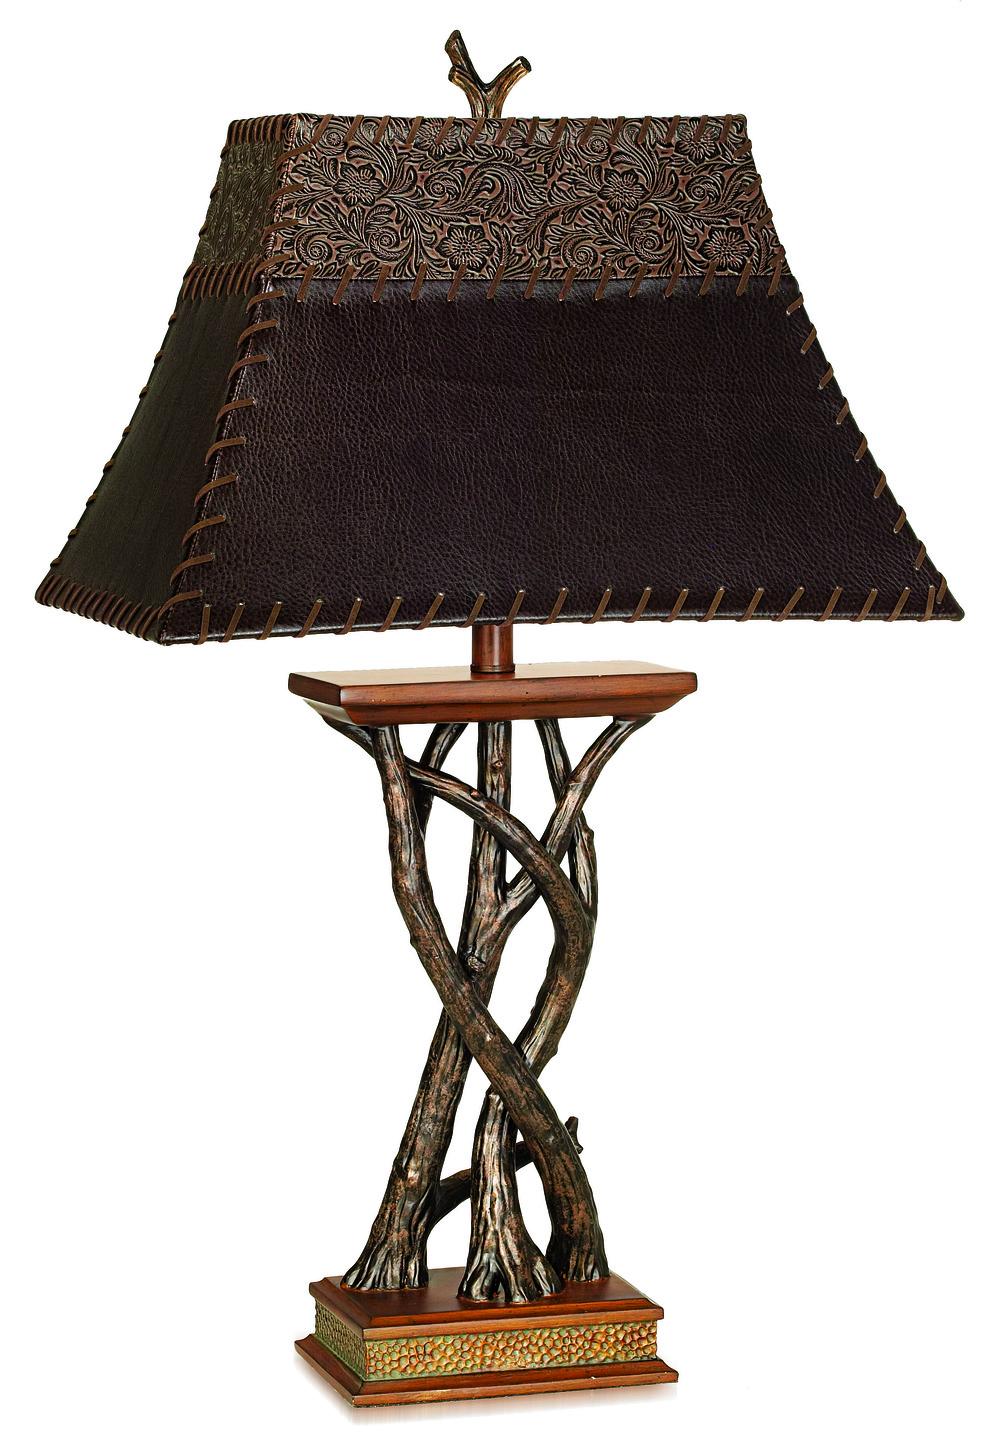 Pacific Coast Lighting - Montana Reflections Table Lamp